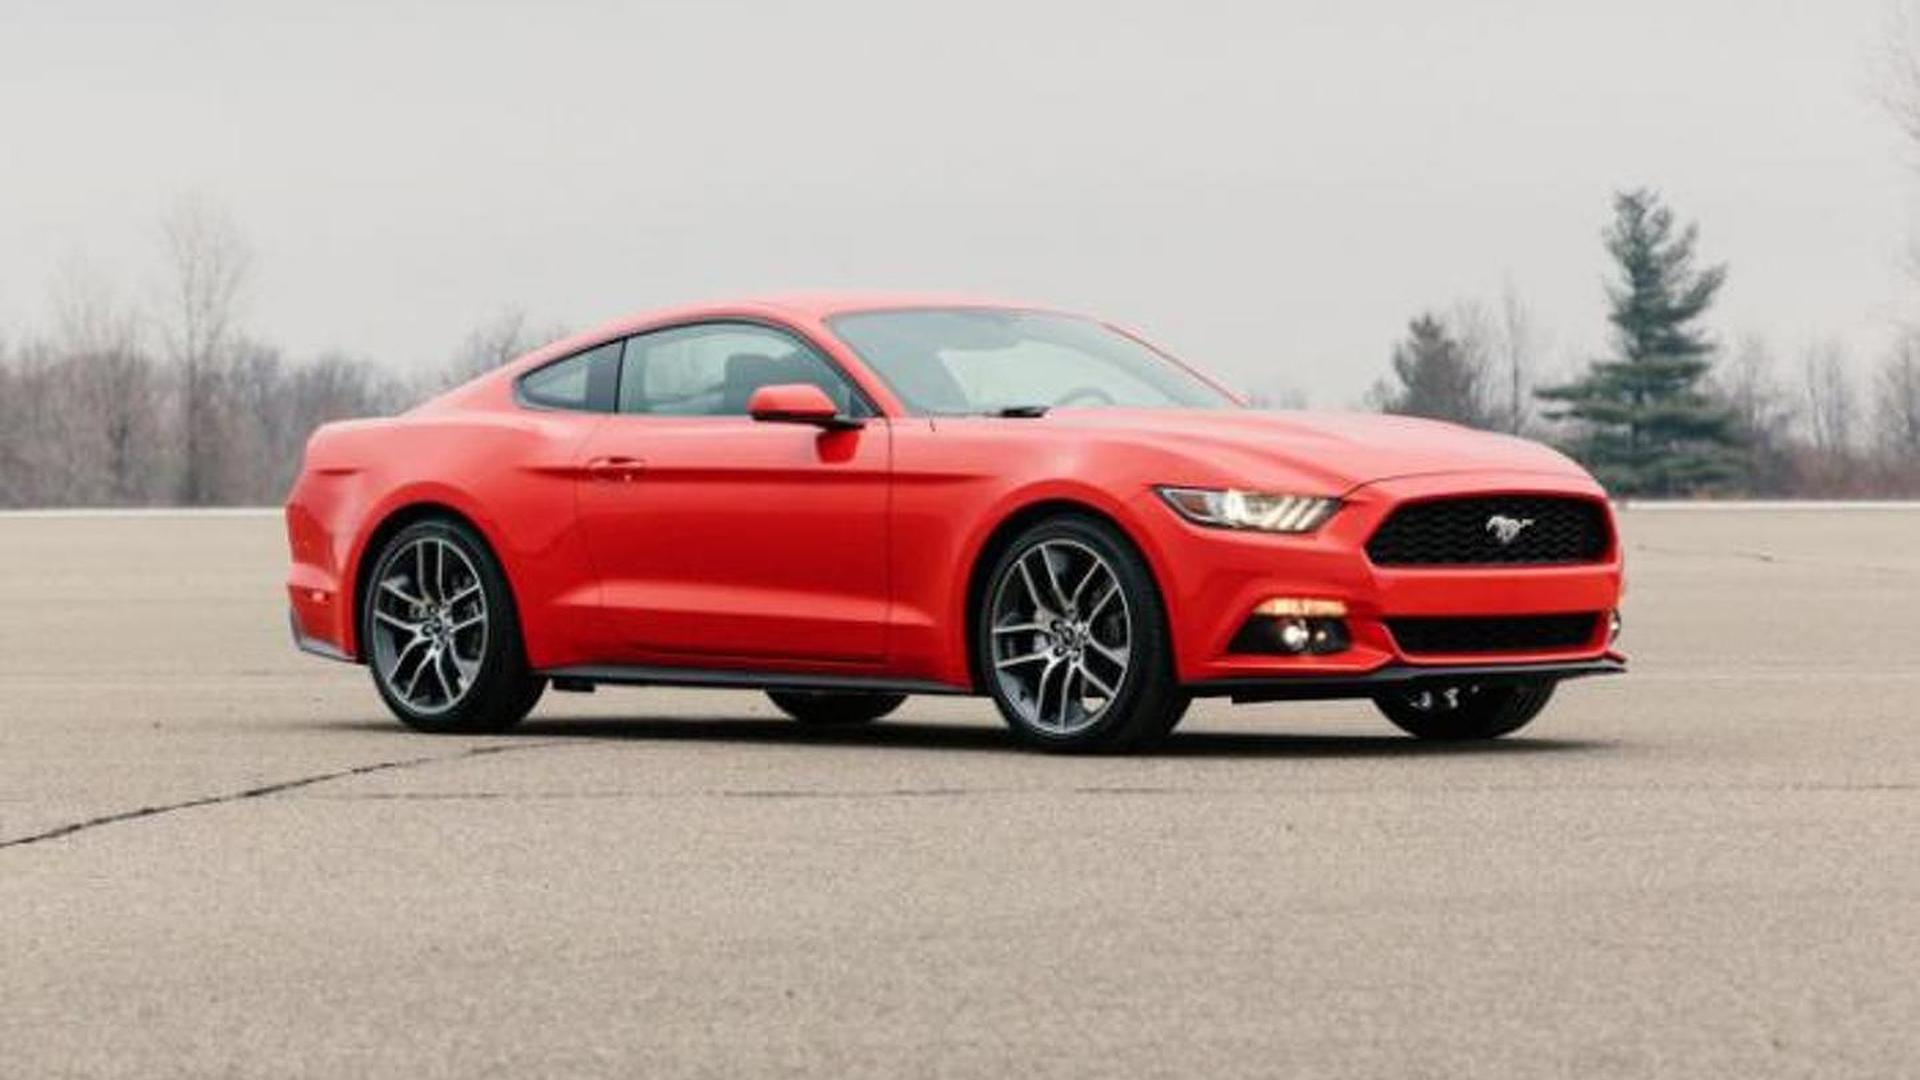 2015 Ford Mustang GT filmed up close revving its V8 engine [video]